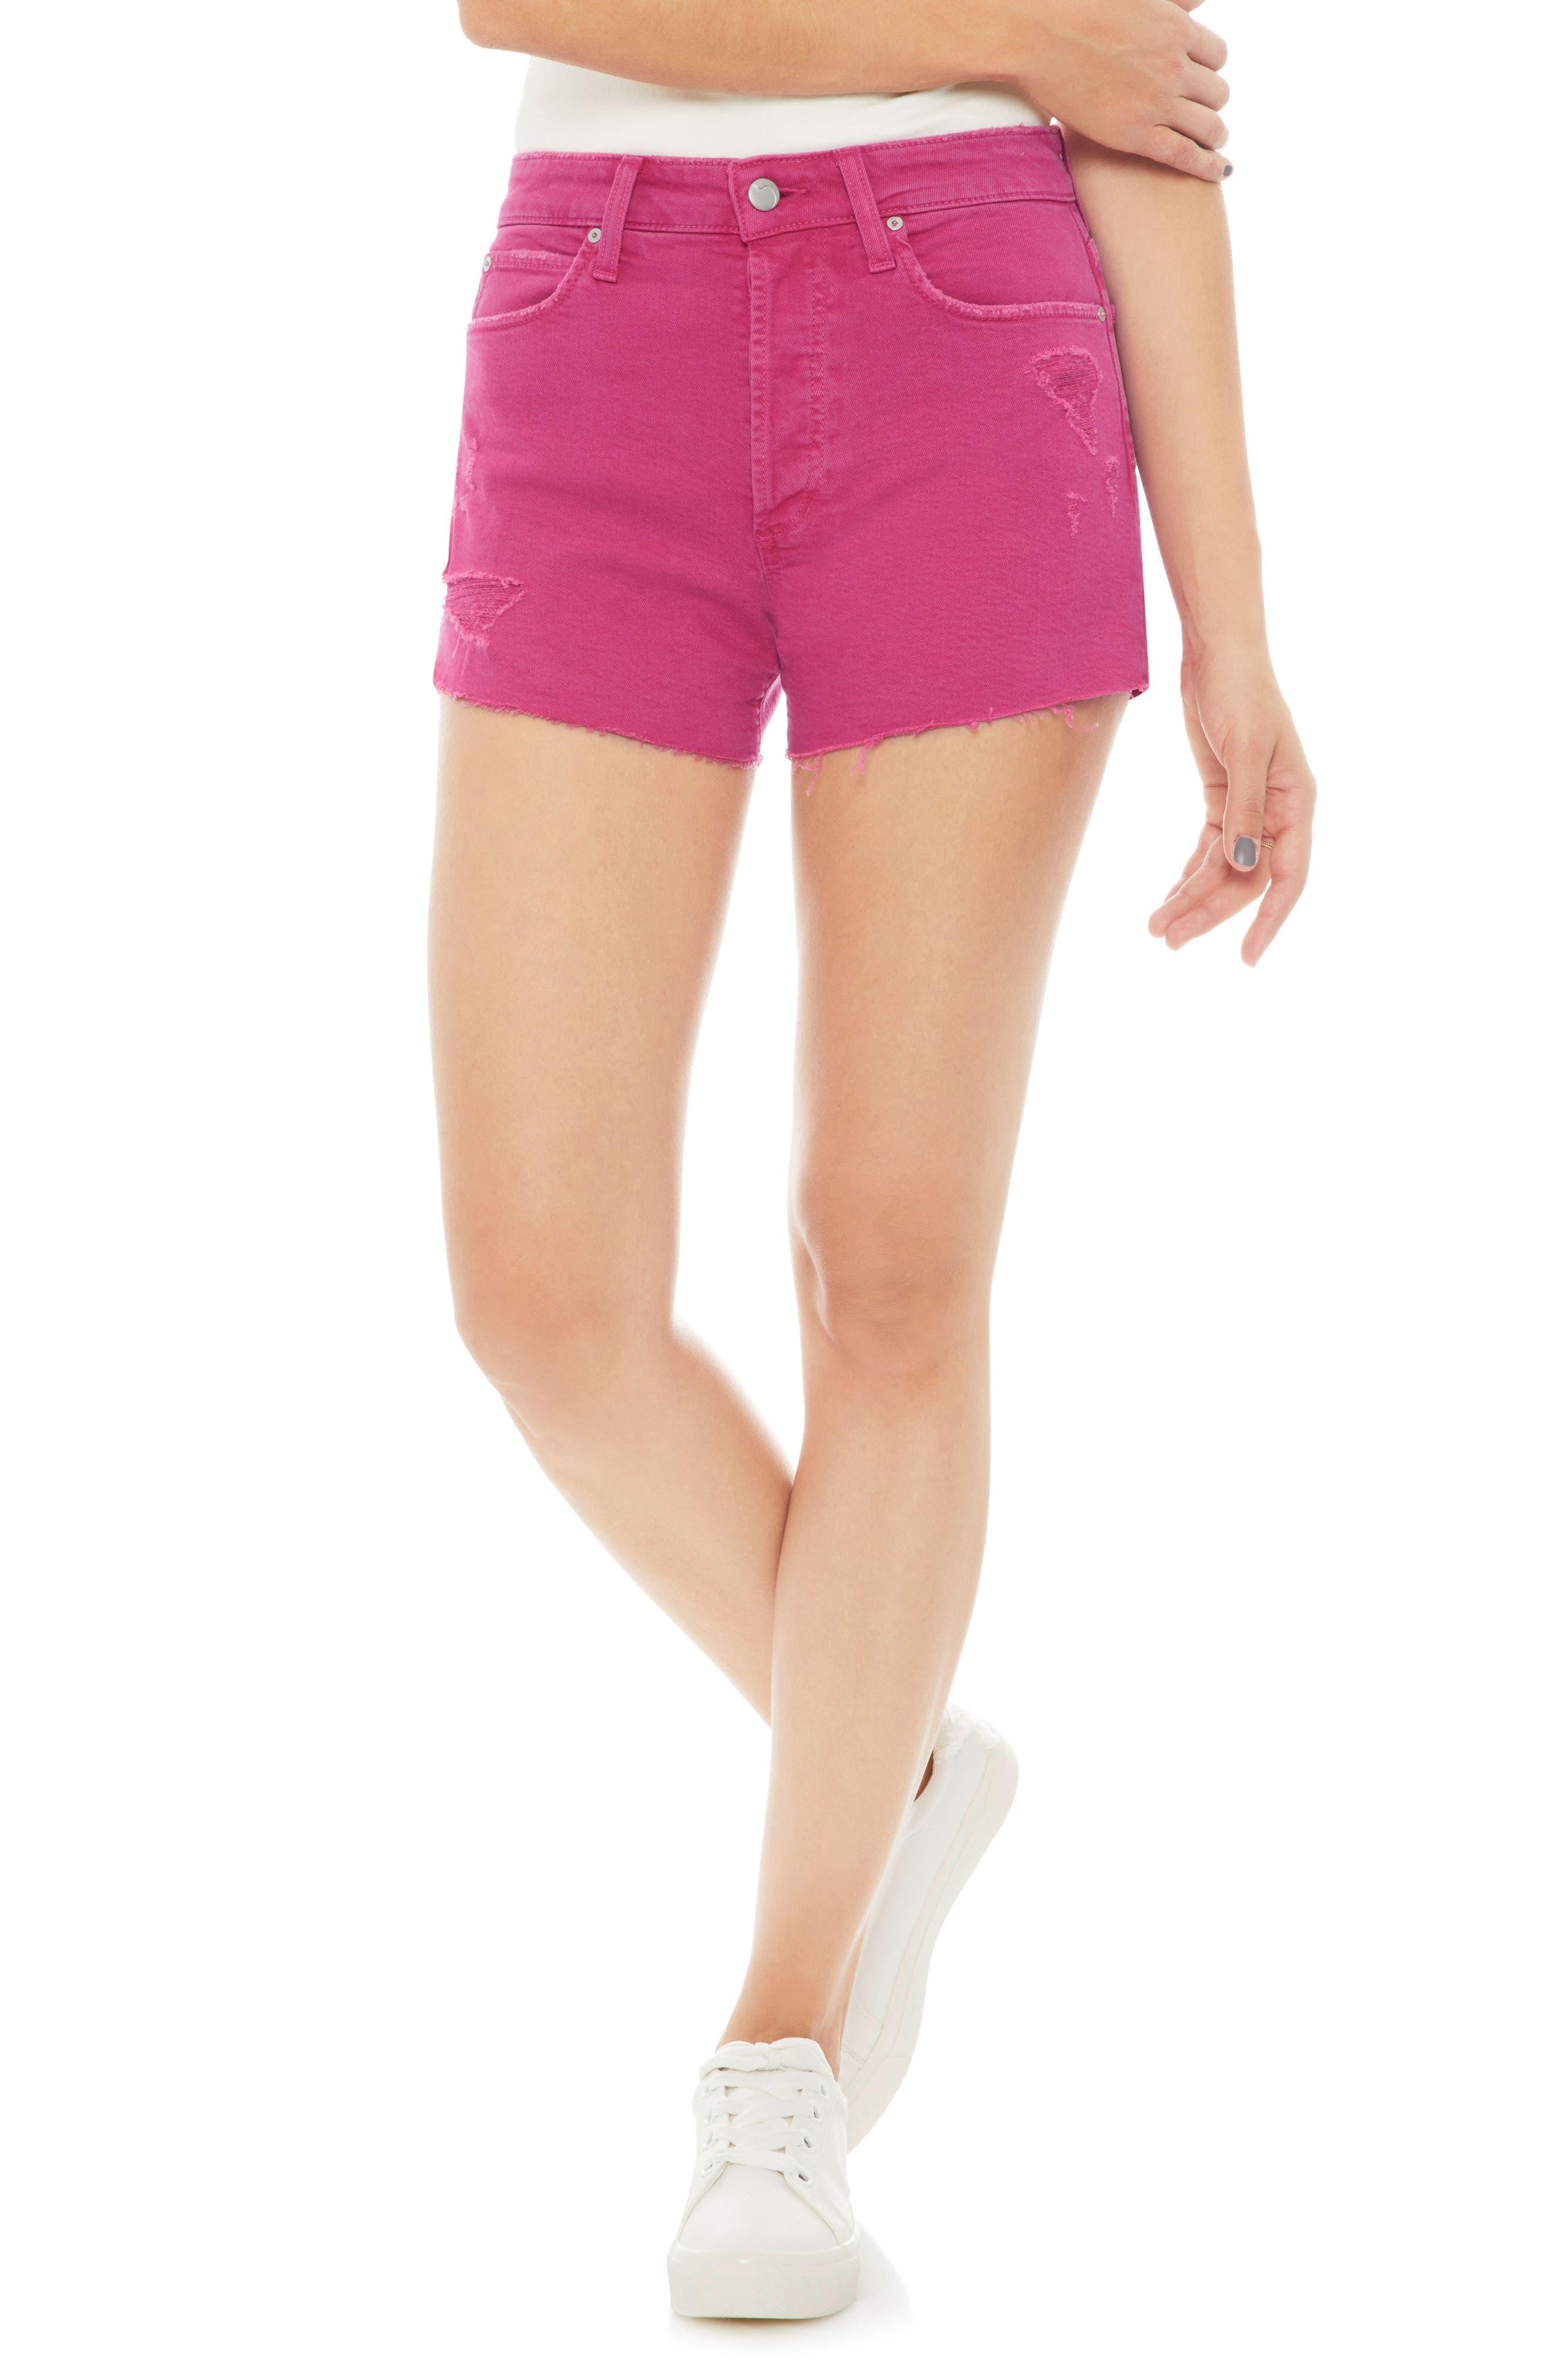 Smith High Waist Shorts,                             Main thumbnail 1, color,                             670